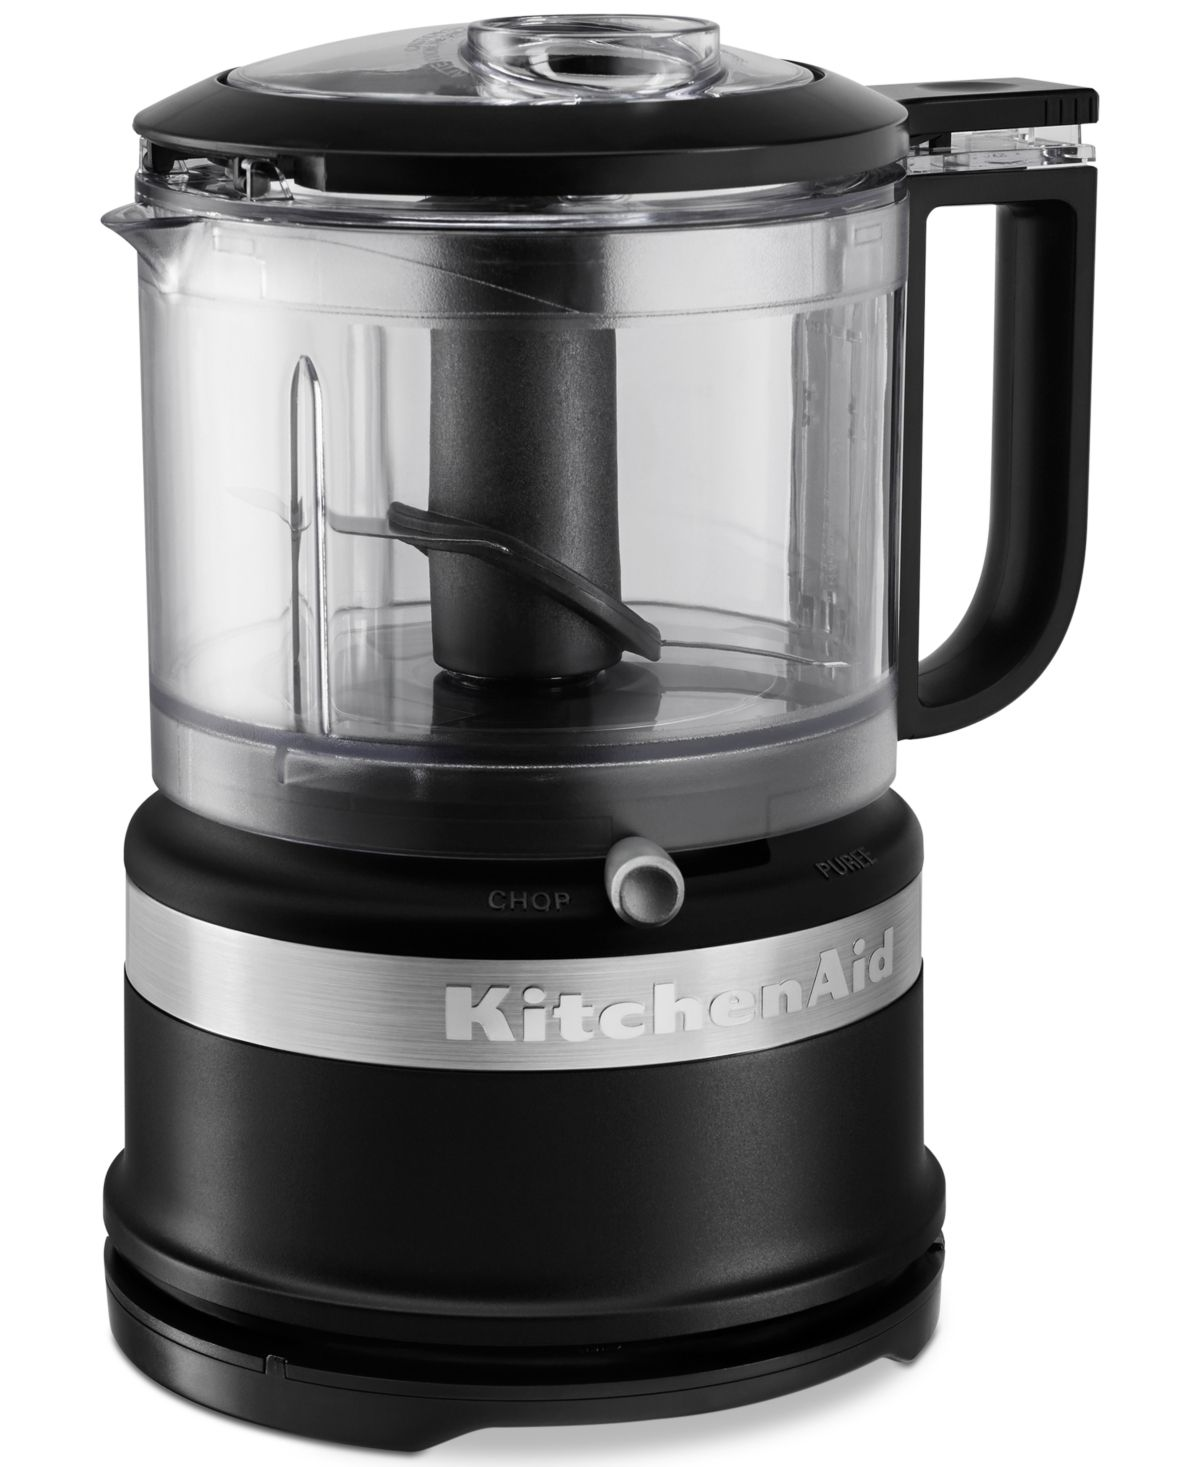 Kitchenaid 35 cup food chopper kfc3516 empire red